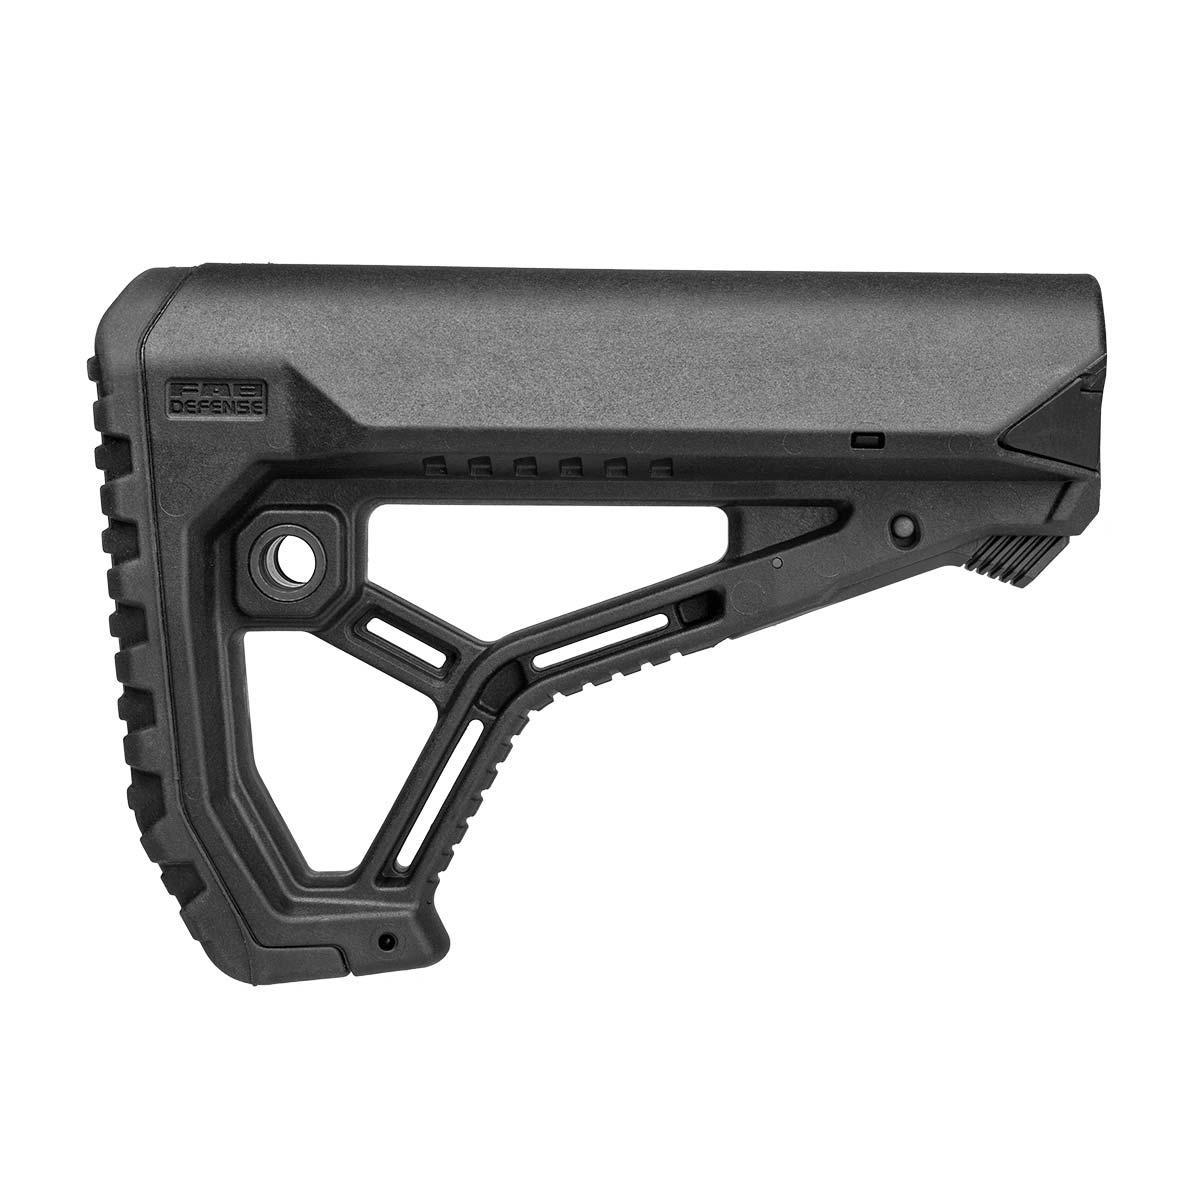 fab-defense-gl-core-lightweight-tactical-ar15-stock-1